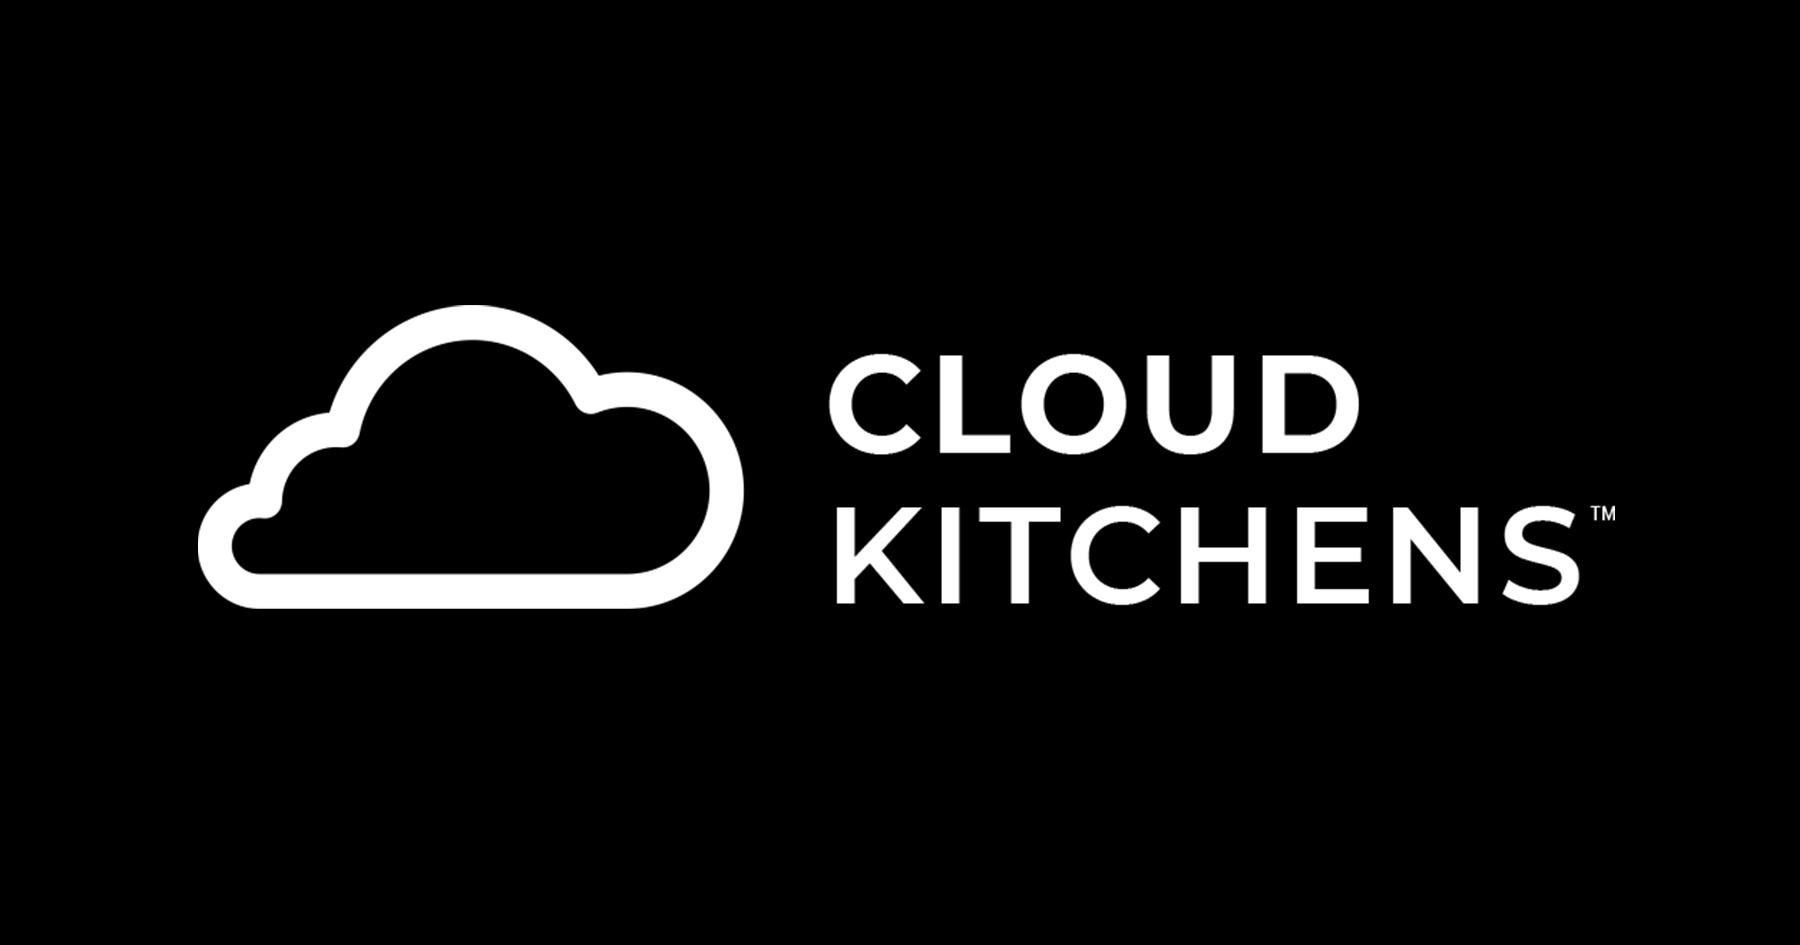 cloud-kitchens-logo_1603302029